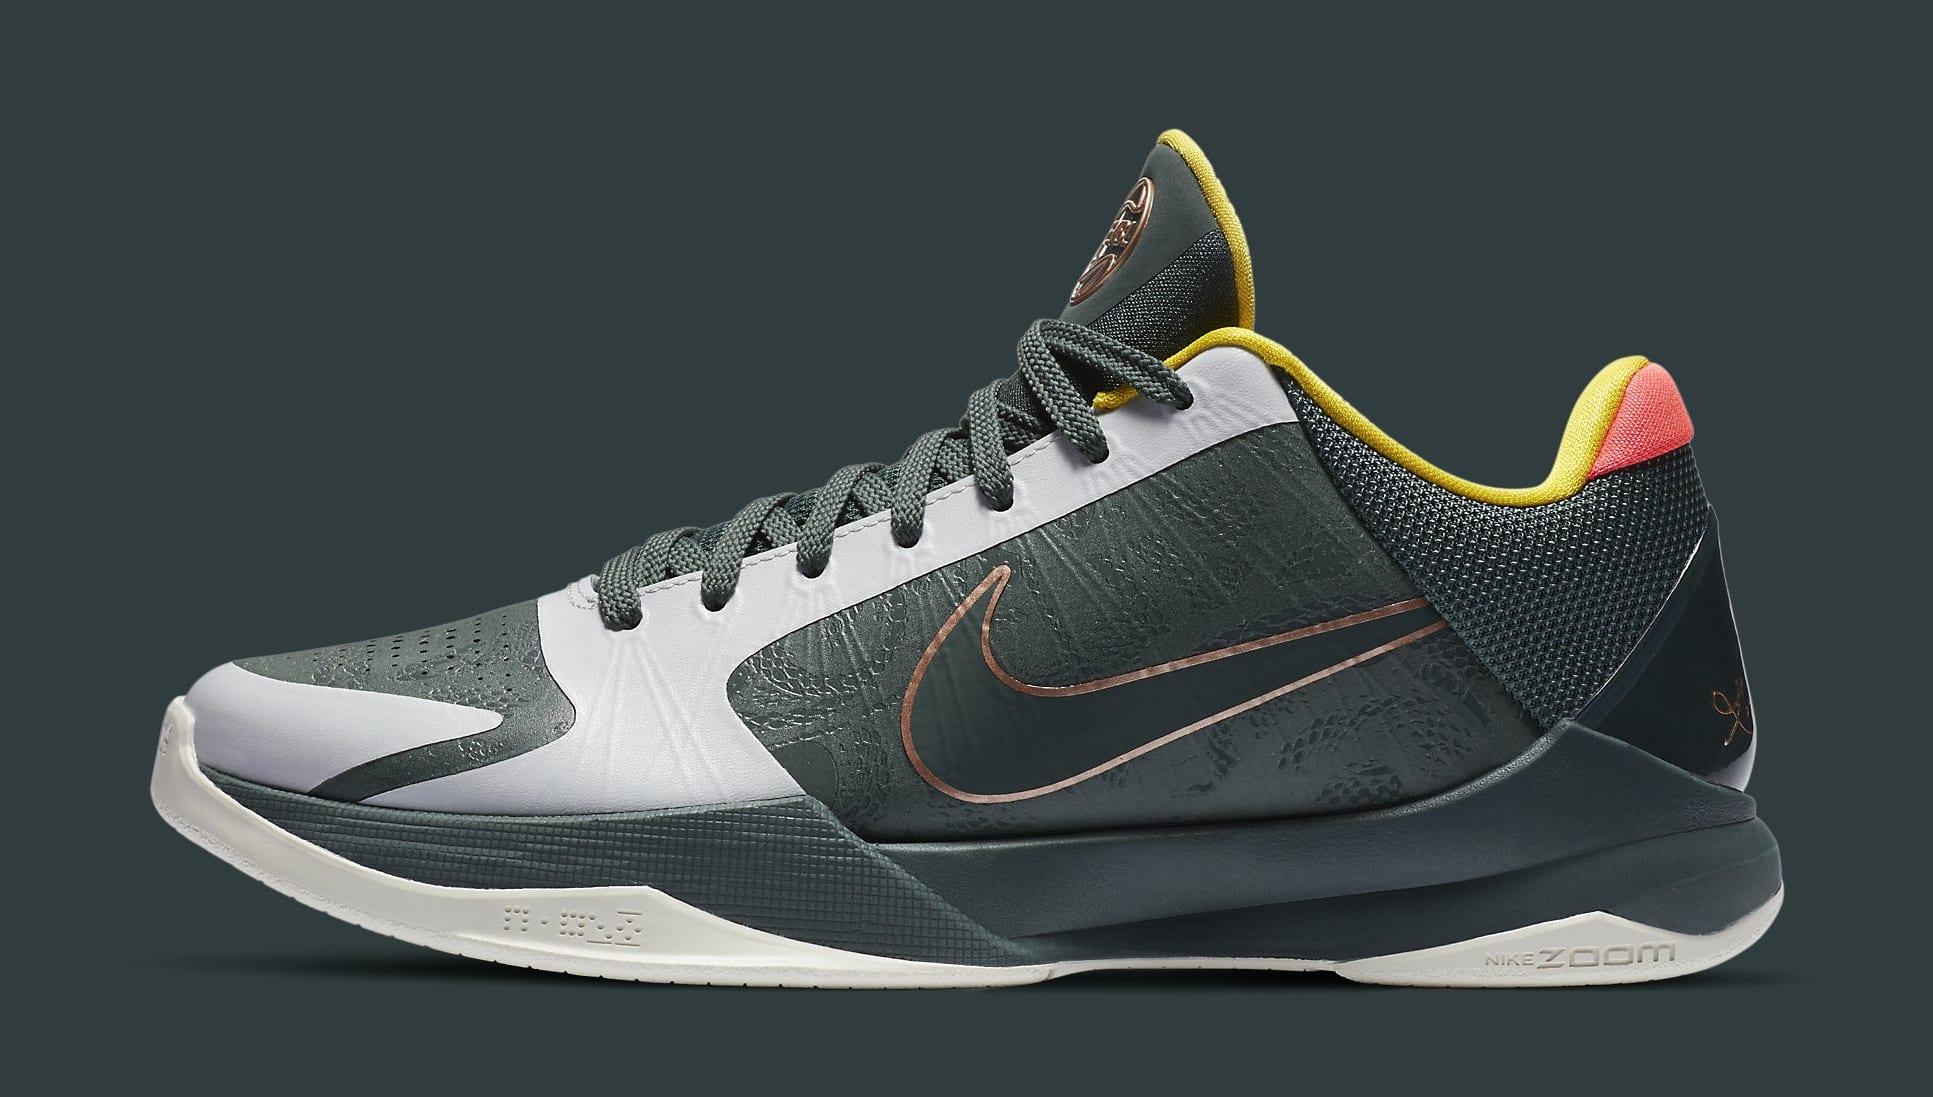 Nike Kobe 5 Protro 'EYBL' CD4991-300 Lateral